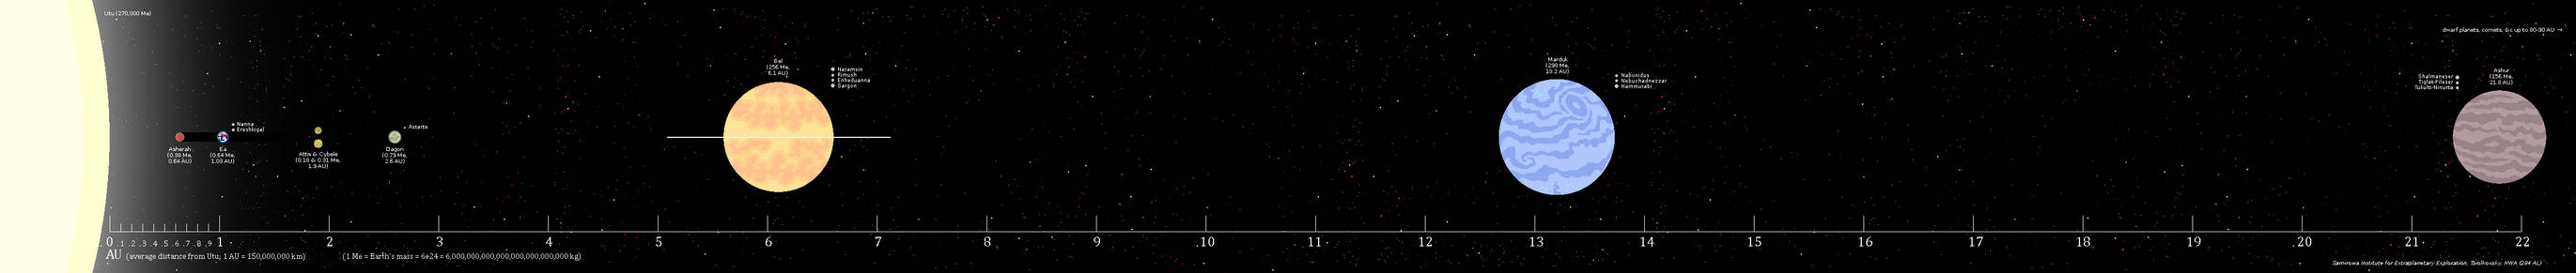 Utu's solar system